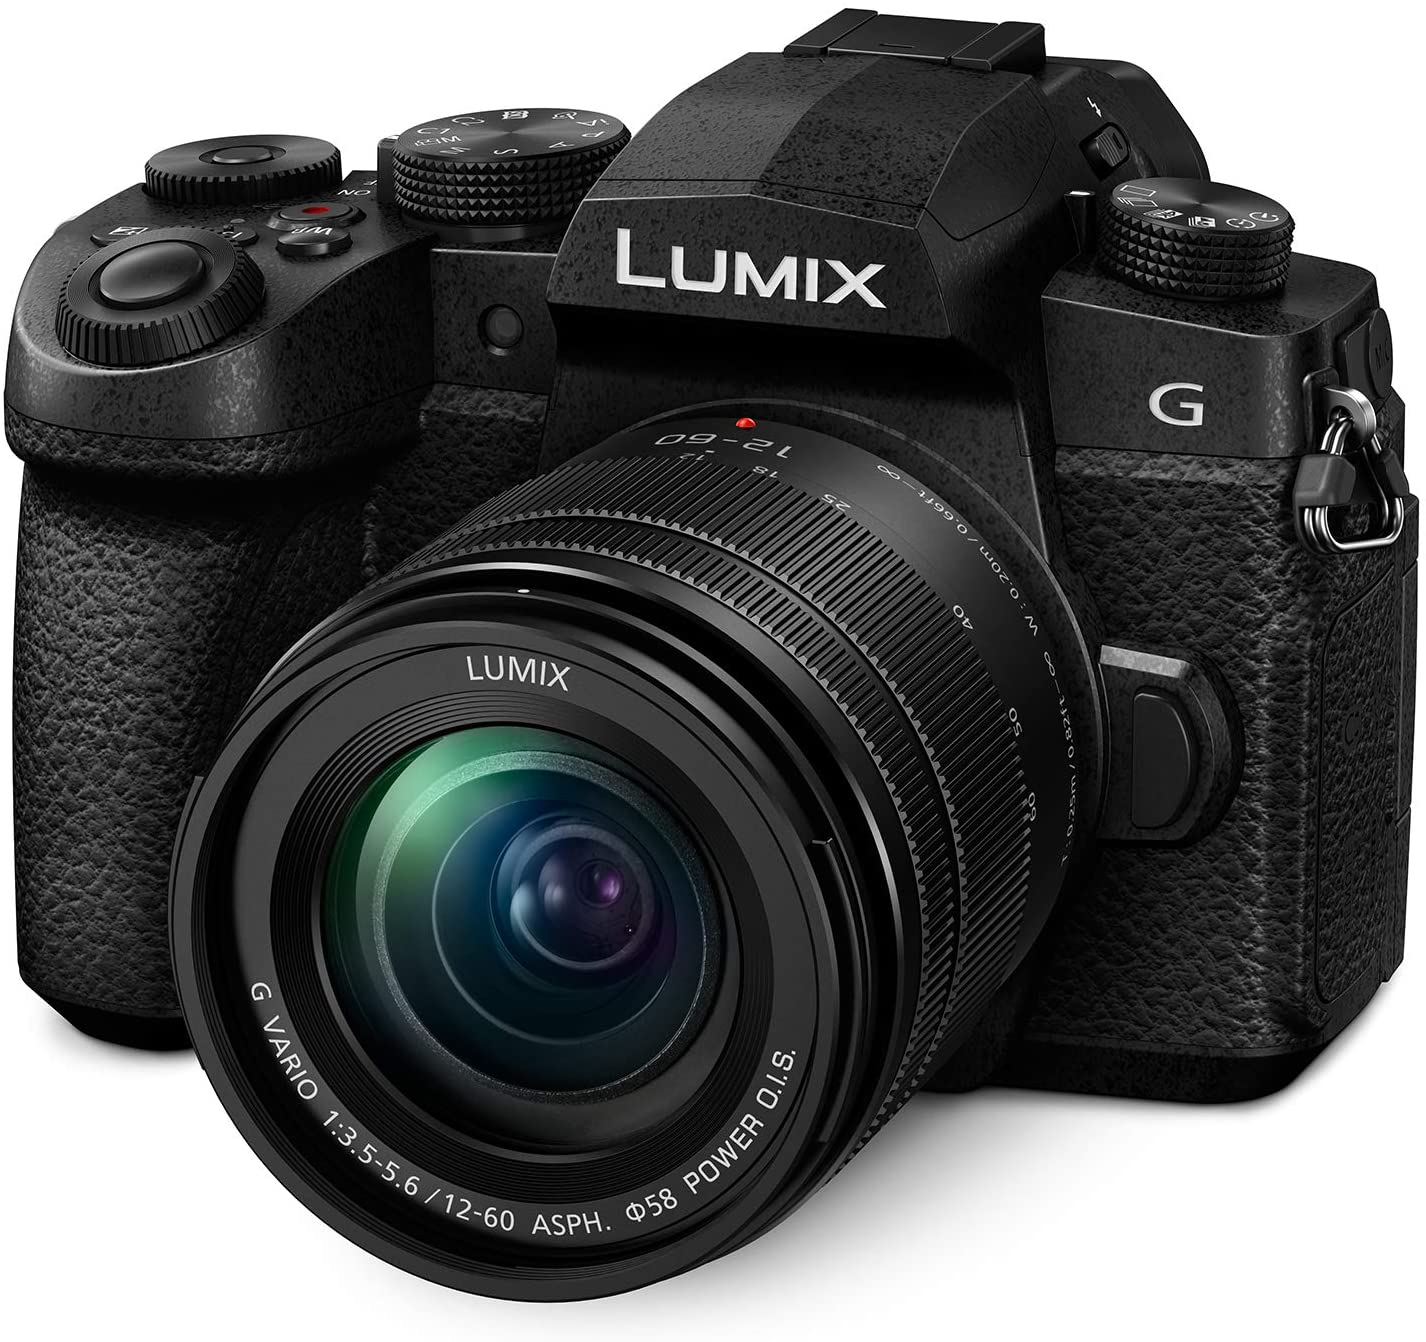 Hot Deal: Panasonic LUMIX G95 w/ 12-60mm F3.5-5.6 Lens for $699.99!